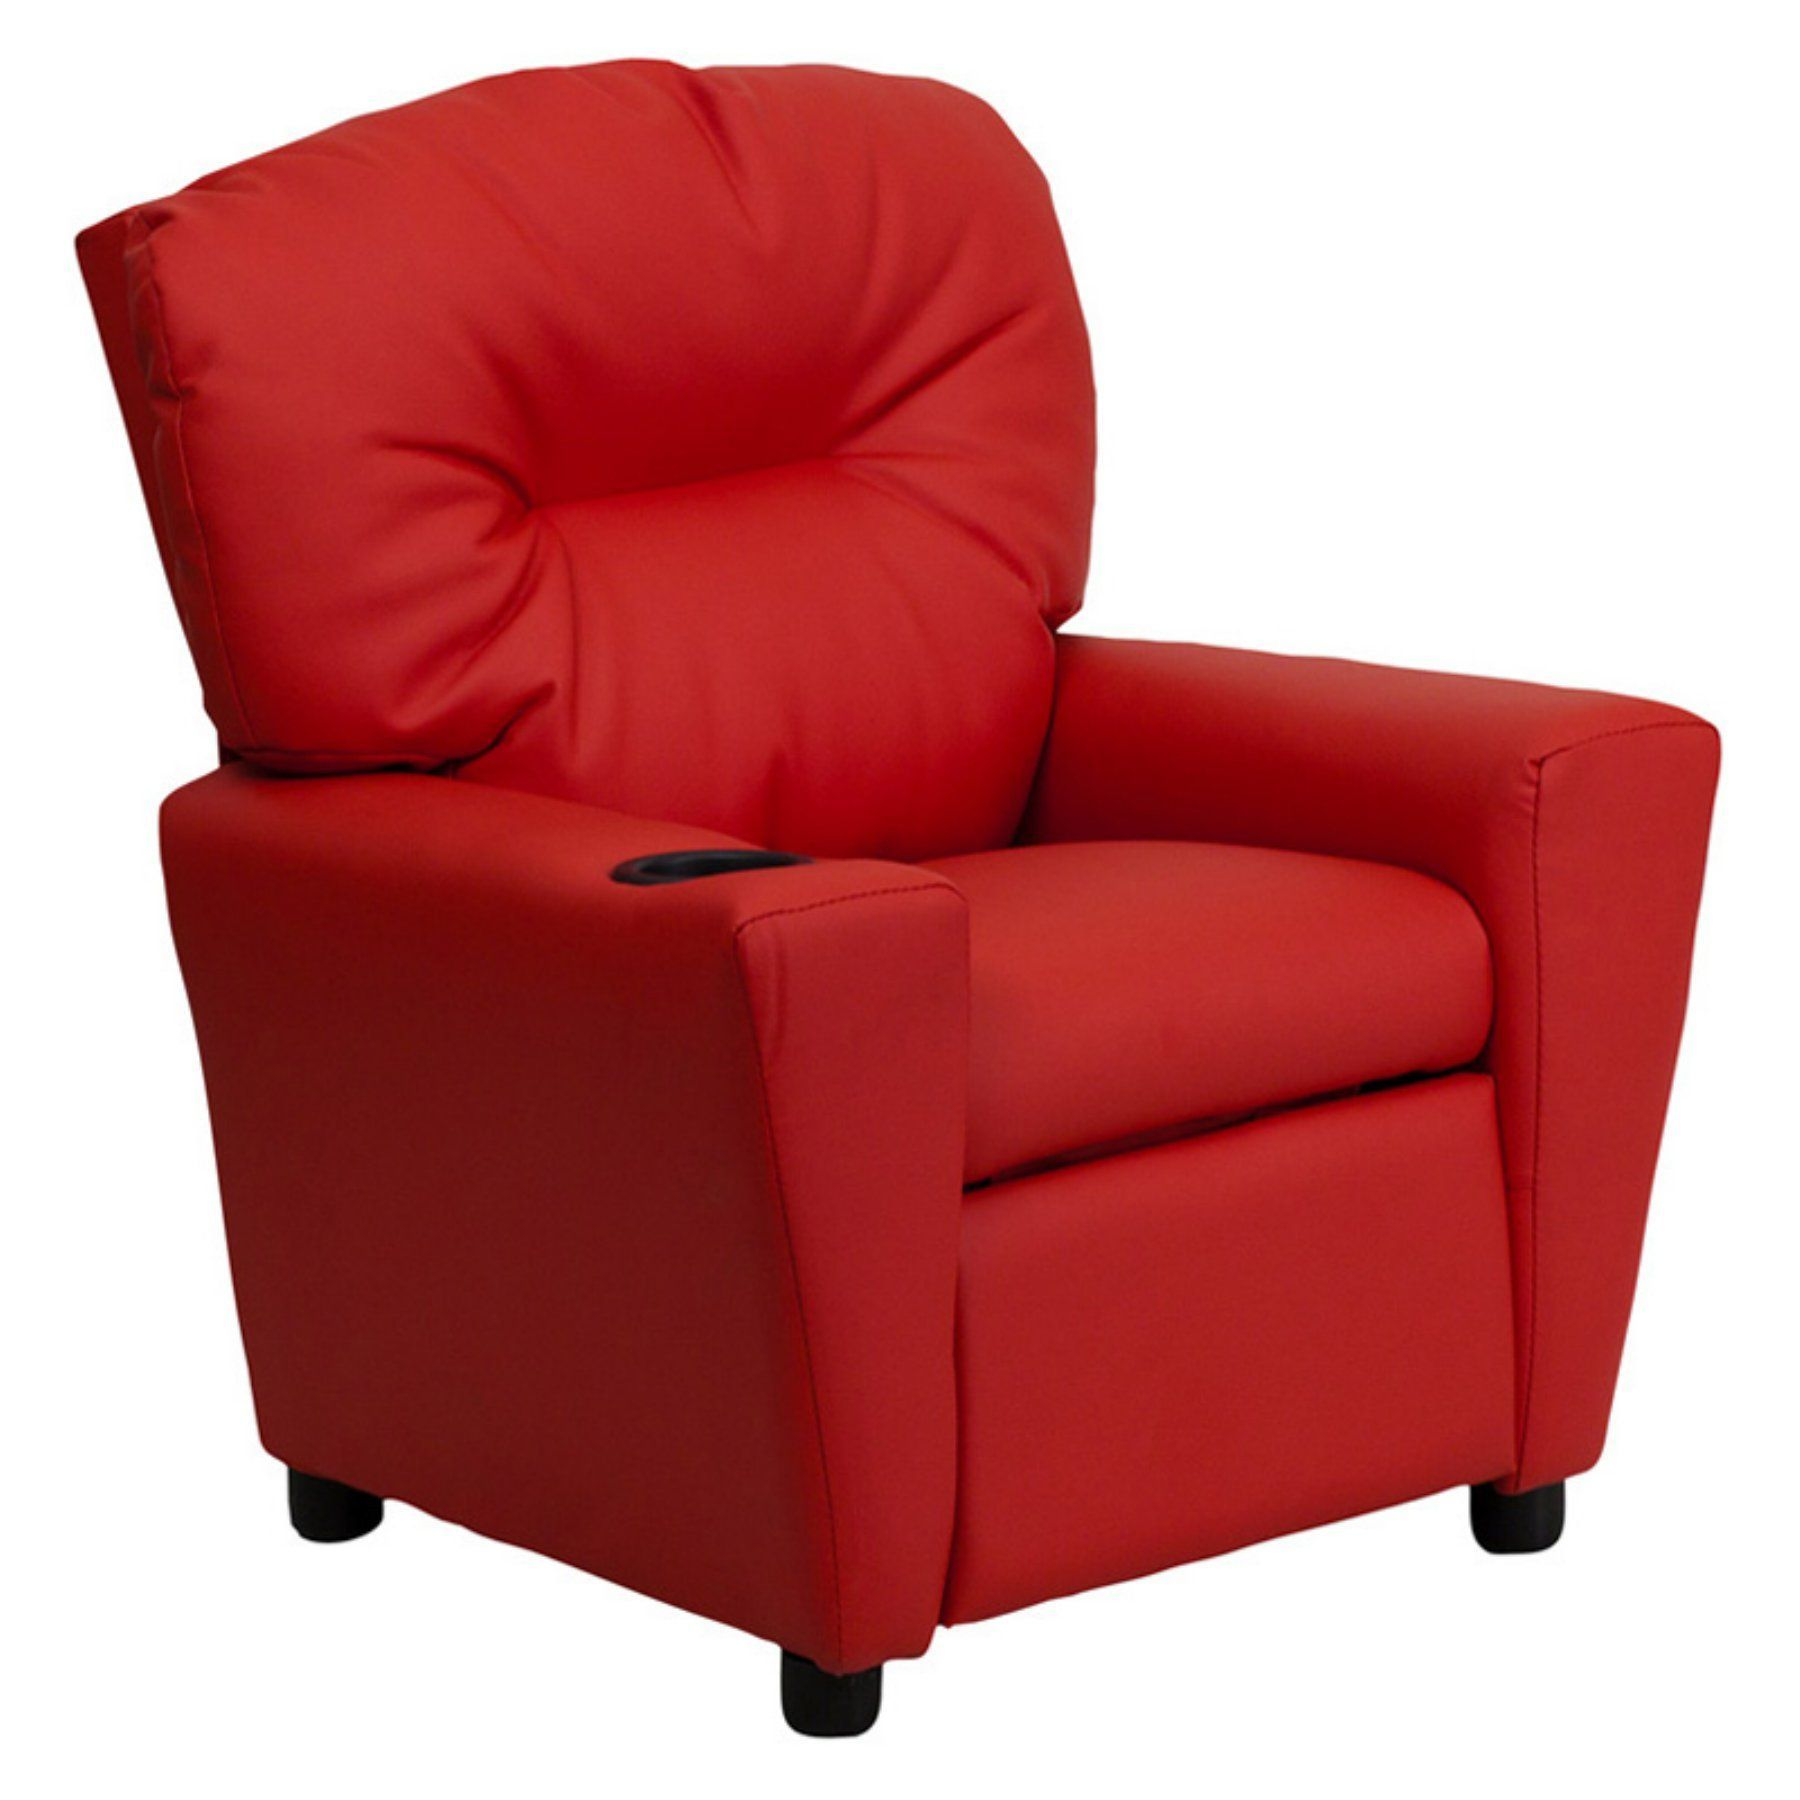 Prime Flash Furniture Vinyl Kids Recliner With Cup Holder Red Machost Co Dining Chair Design Ideas Machostcouk